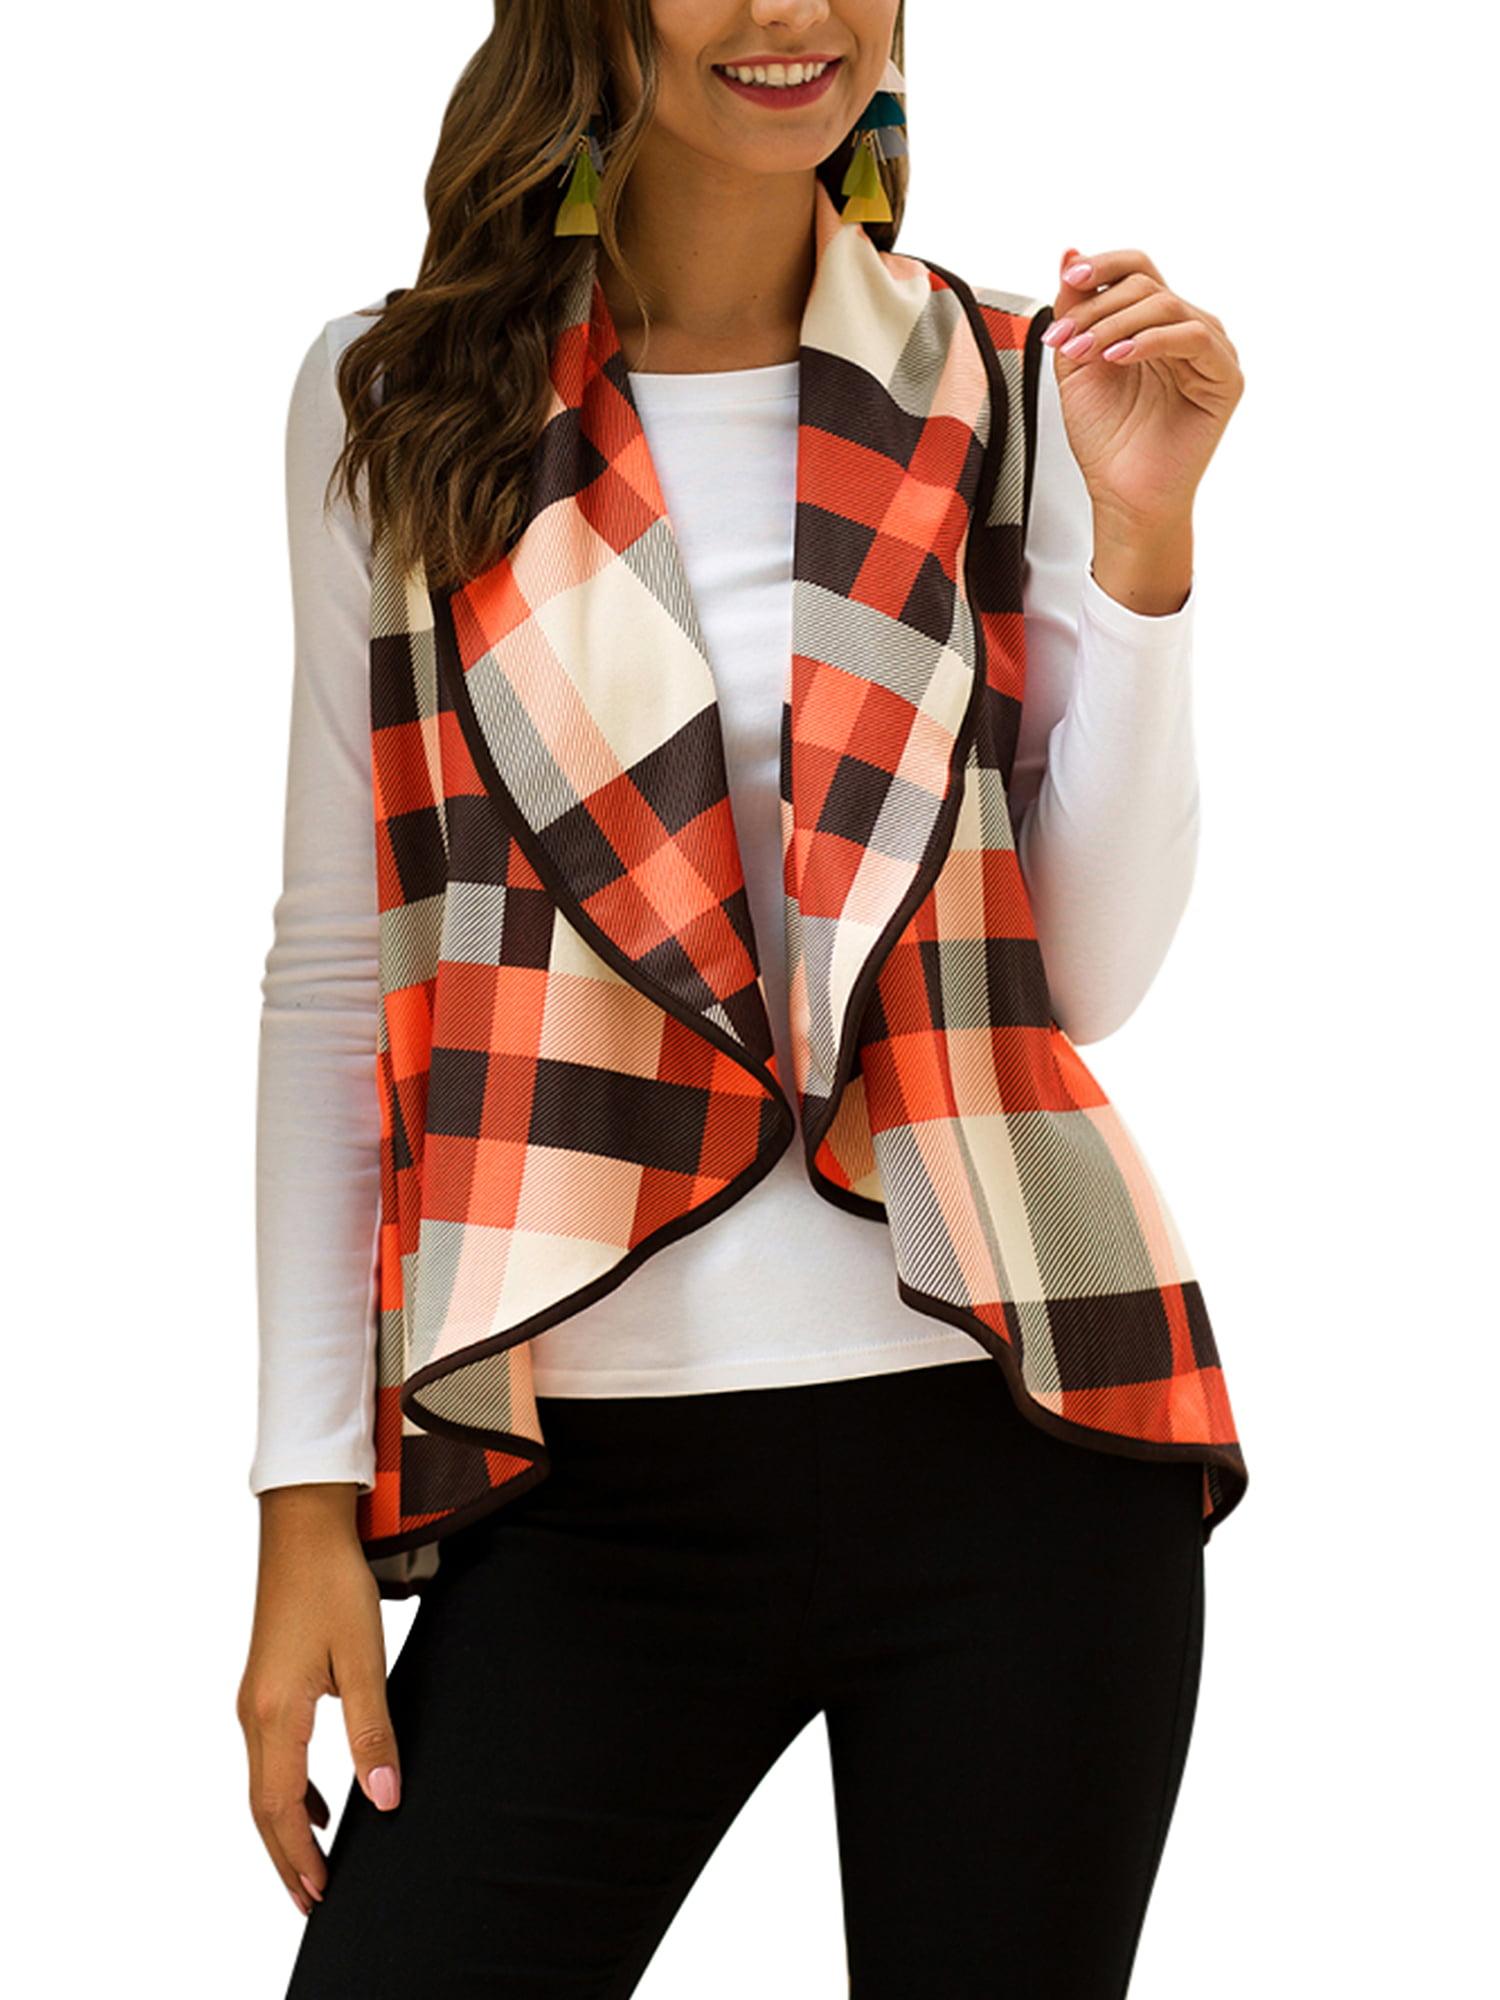 E-Scenery Plaid Vest Cardigan Womens Open Front Color Block Lapel Sleeveless Tops Pockets